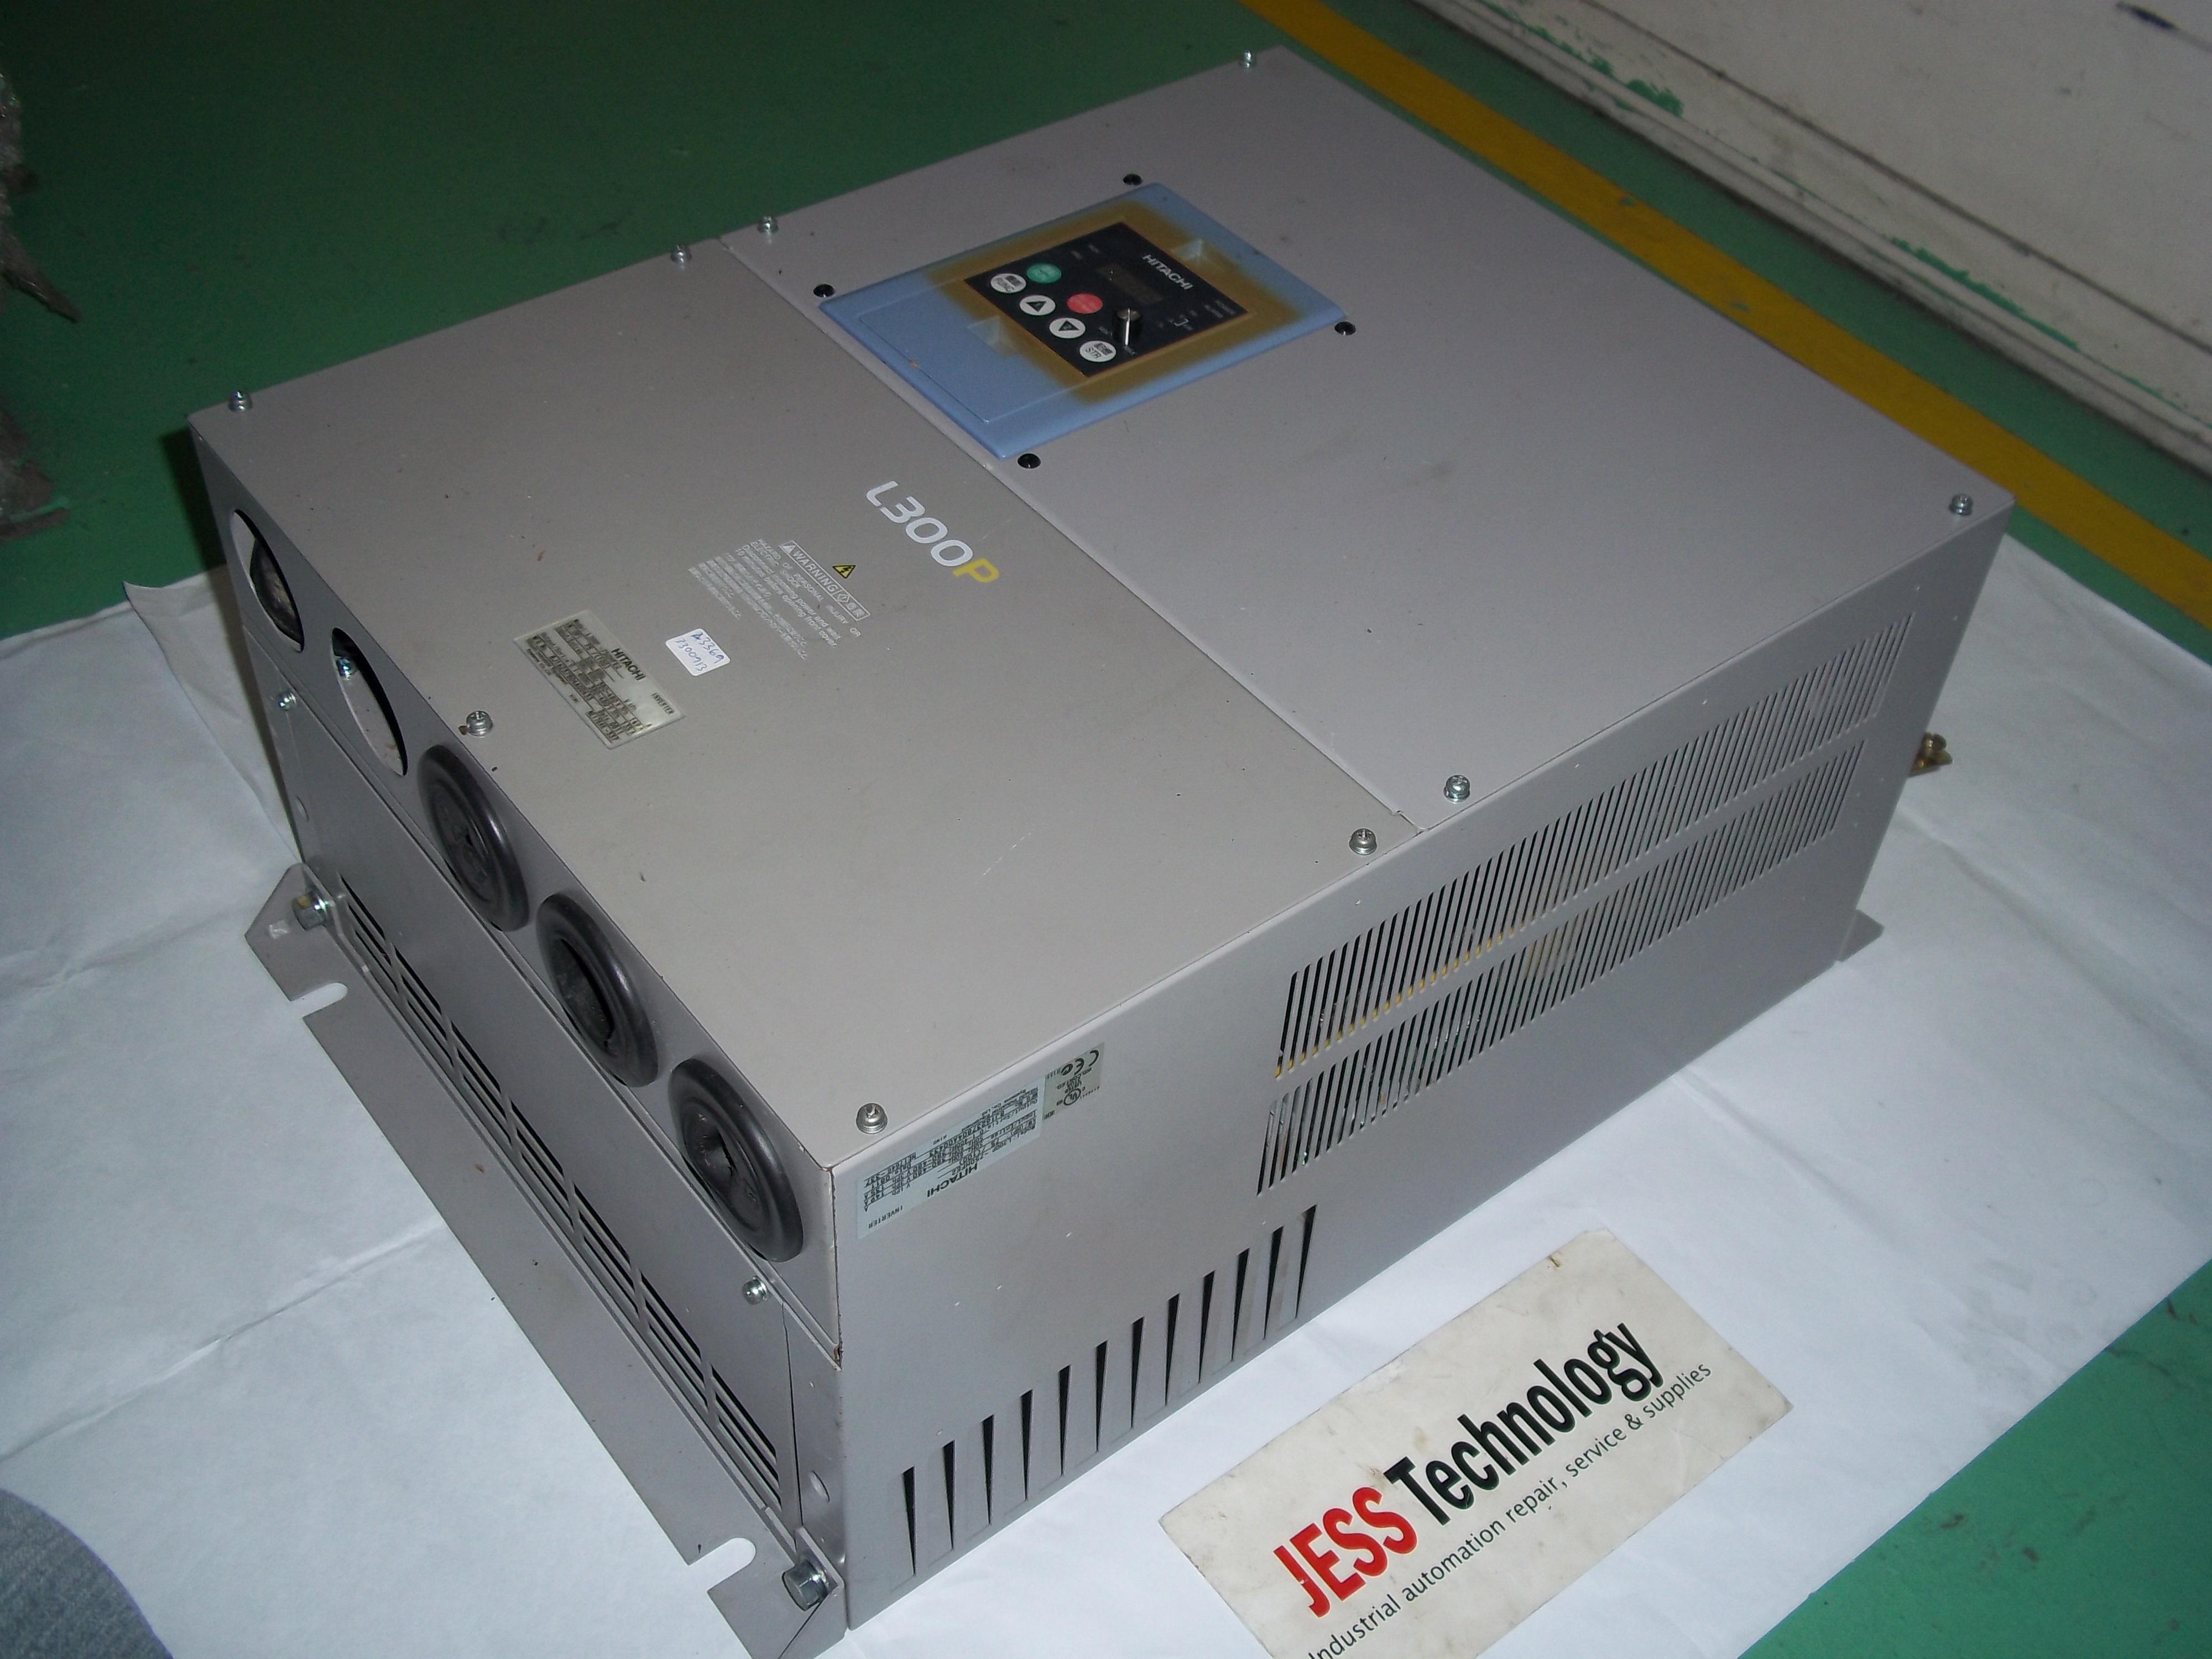 Repair L300P-750HFE2 HITACHI HITACHI L300P INVERTER (L300P-750HFE2) in Malaysia, Singapore, Thailand, Indonesia